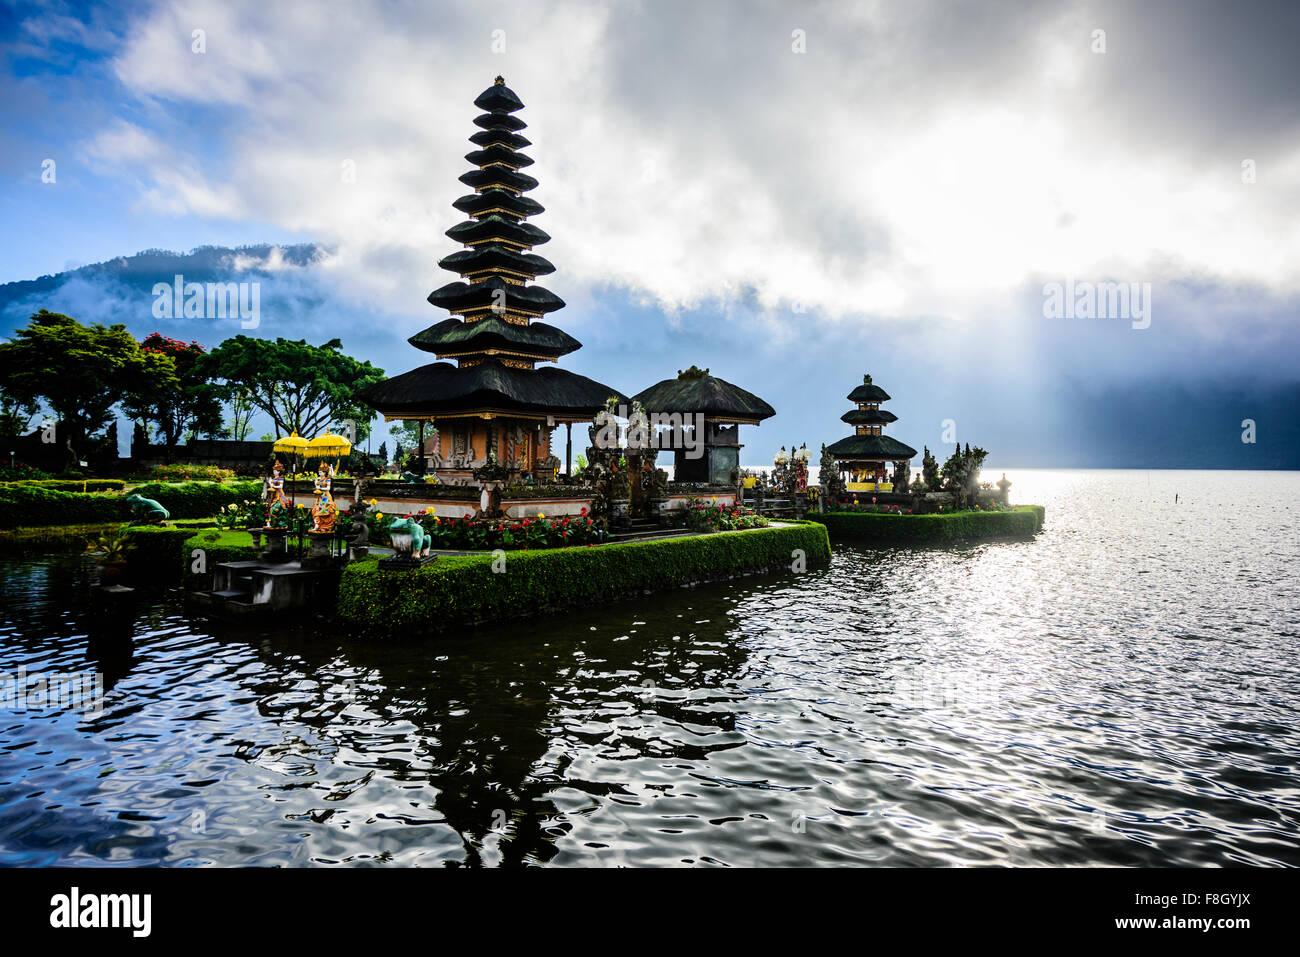 Pagoda flotando sobre el agua, Baturiti, Bali, Indonesia Imagen De Stock